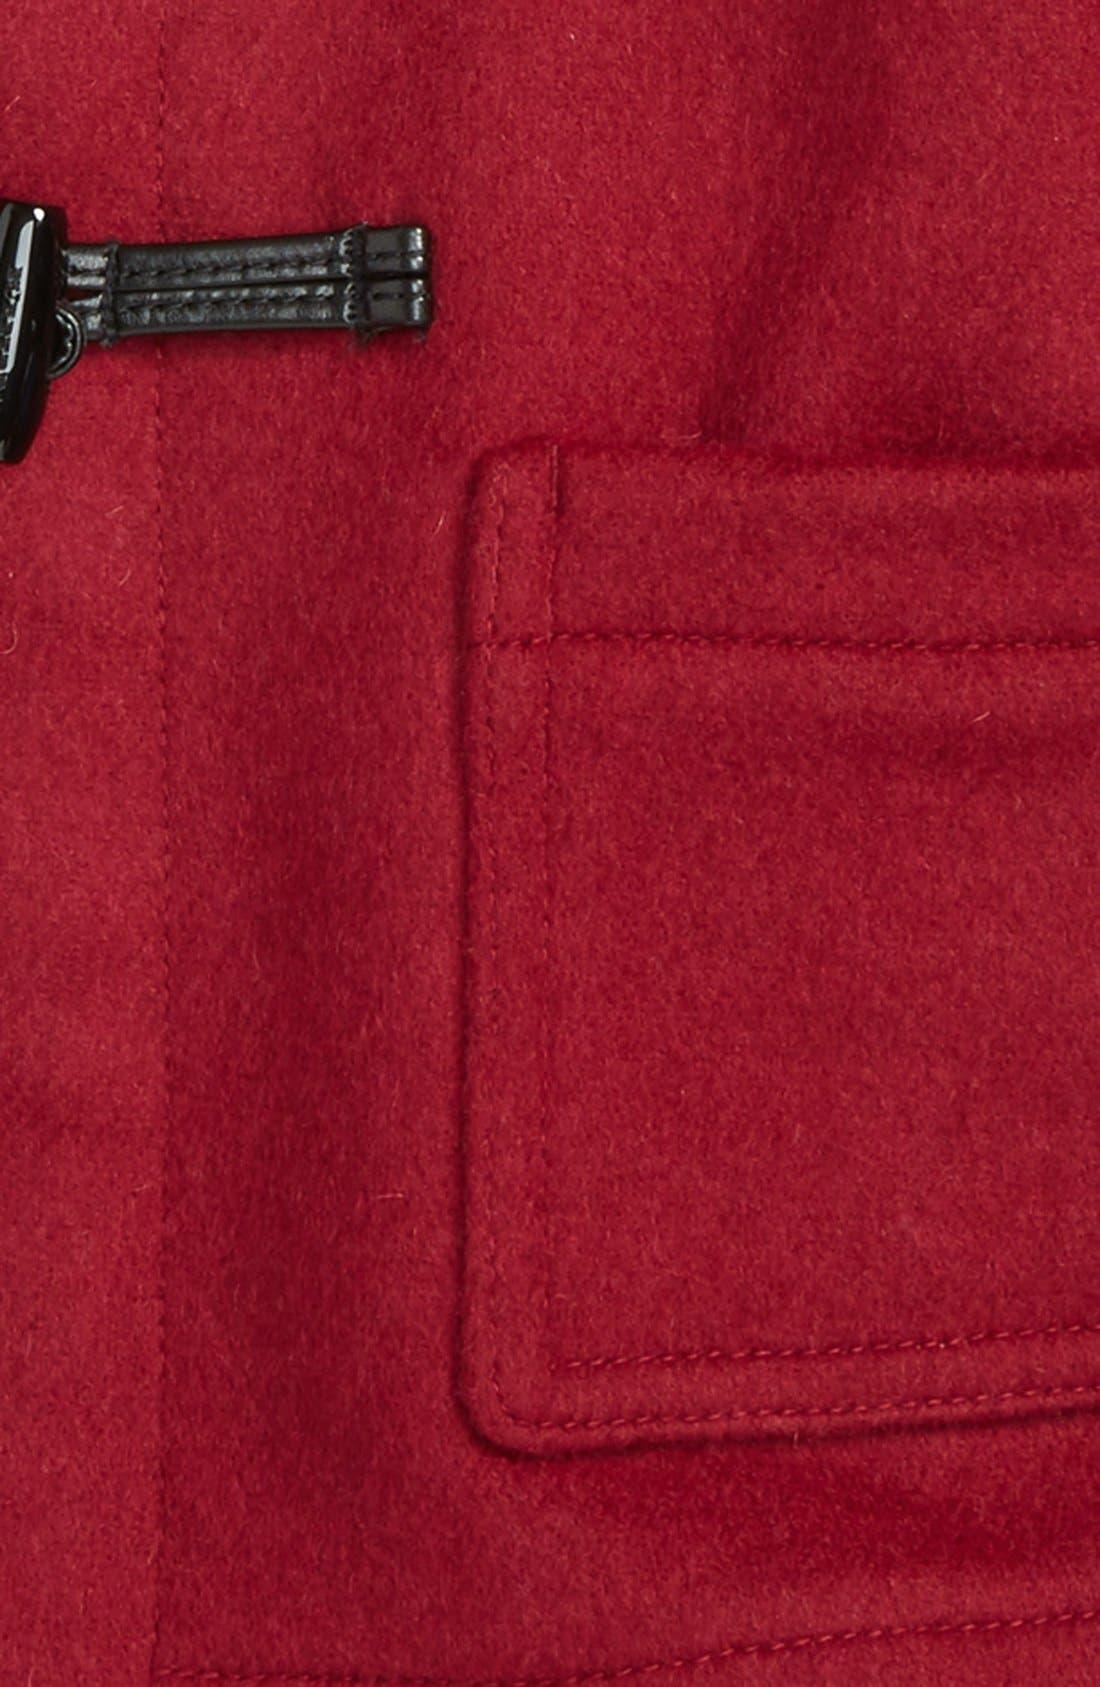 Alternate Image 2  - Burberry 'Brogan' Hooded Wool Toggle Coat (Baby Girls)